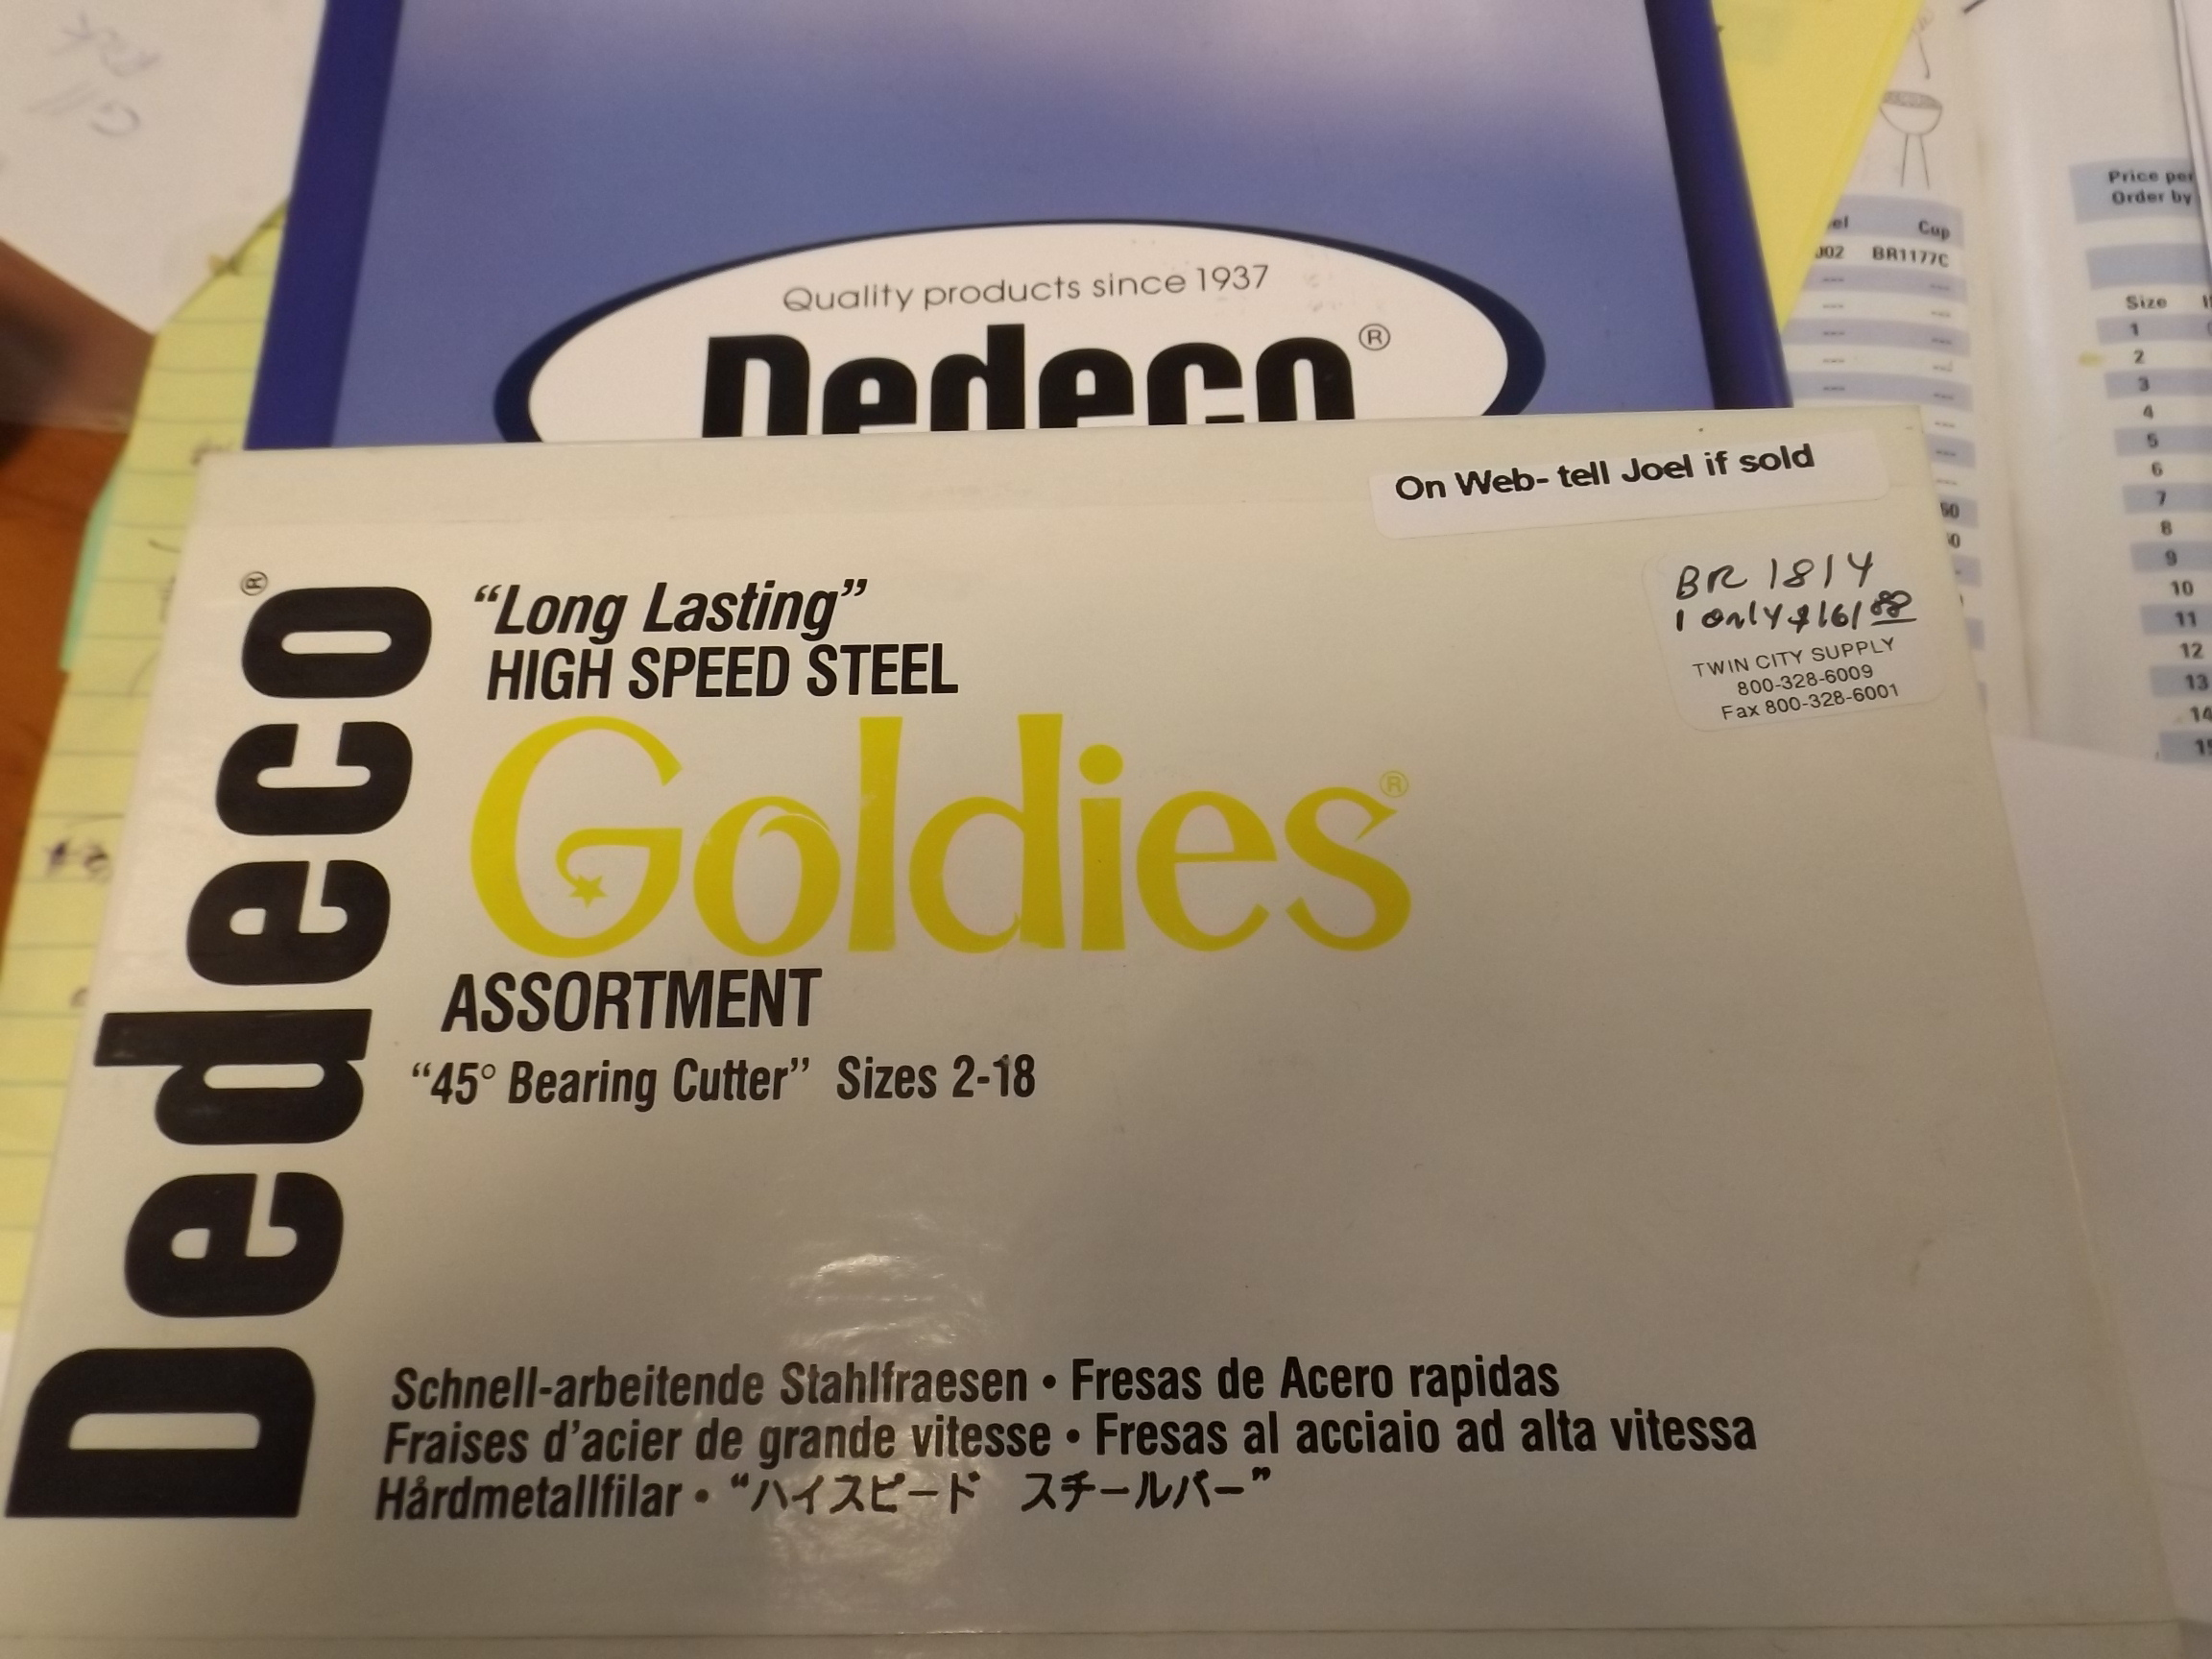 BR1814 Dedeco Goldies High Speed Steel 45* Bearing Cutter Bur Assortment--17 pieces-One only!